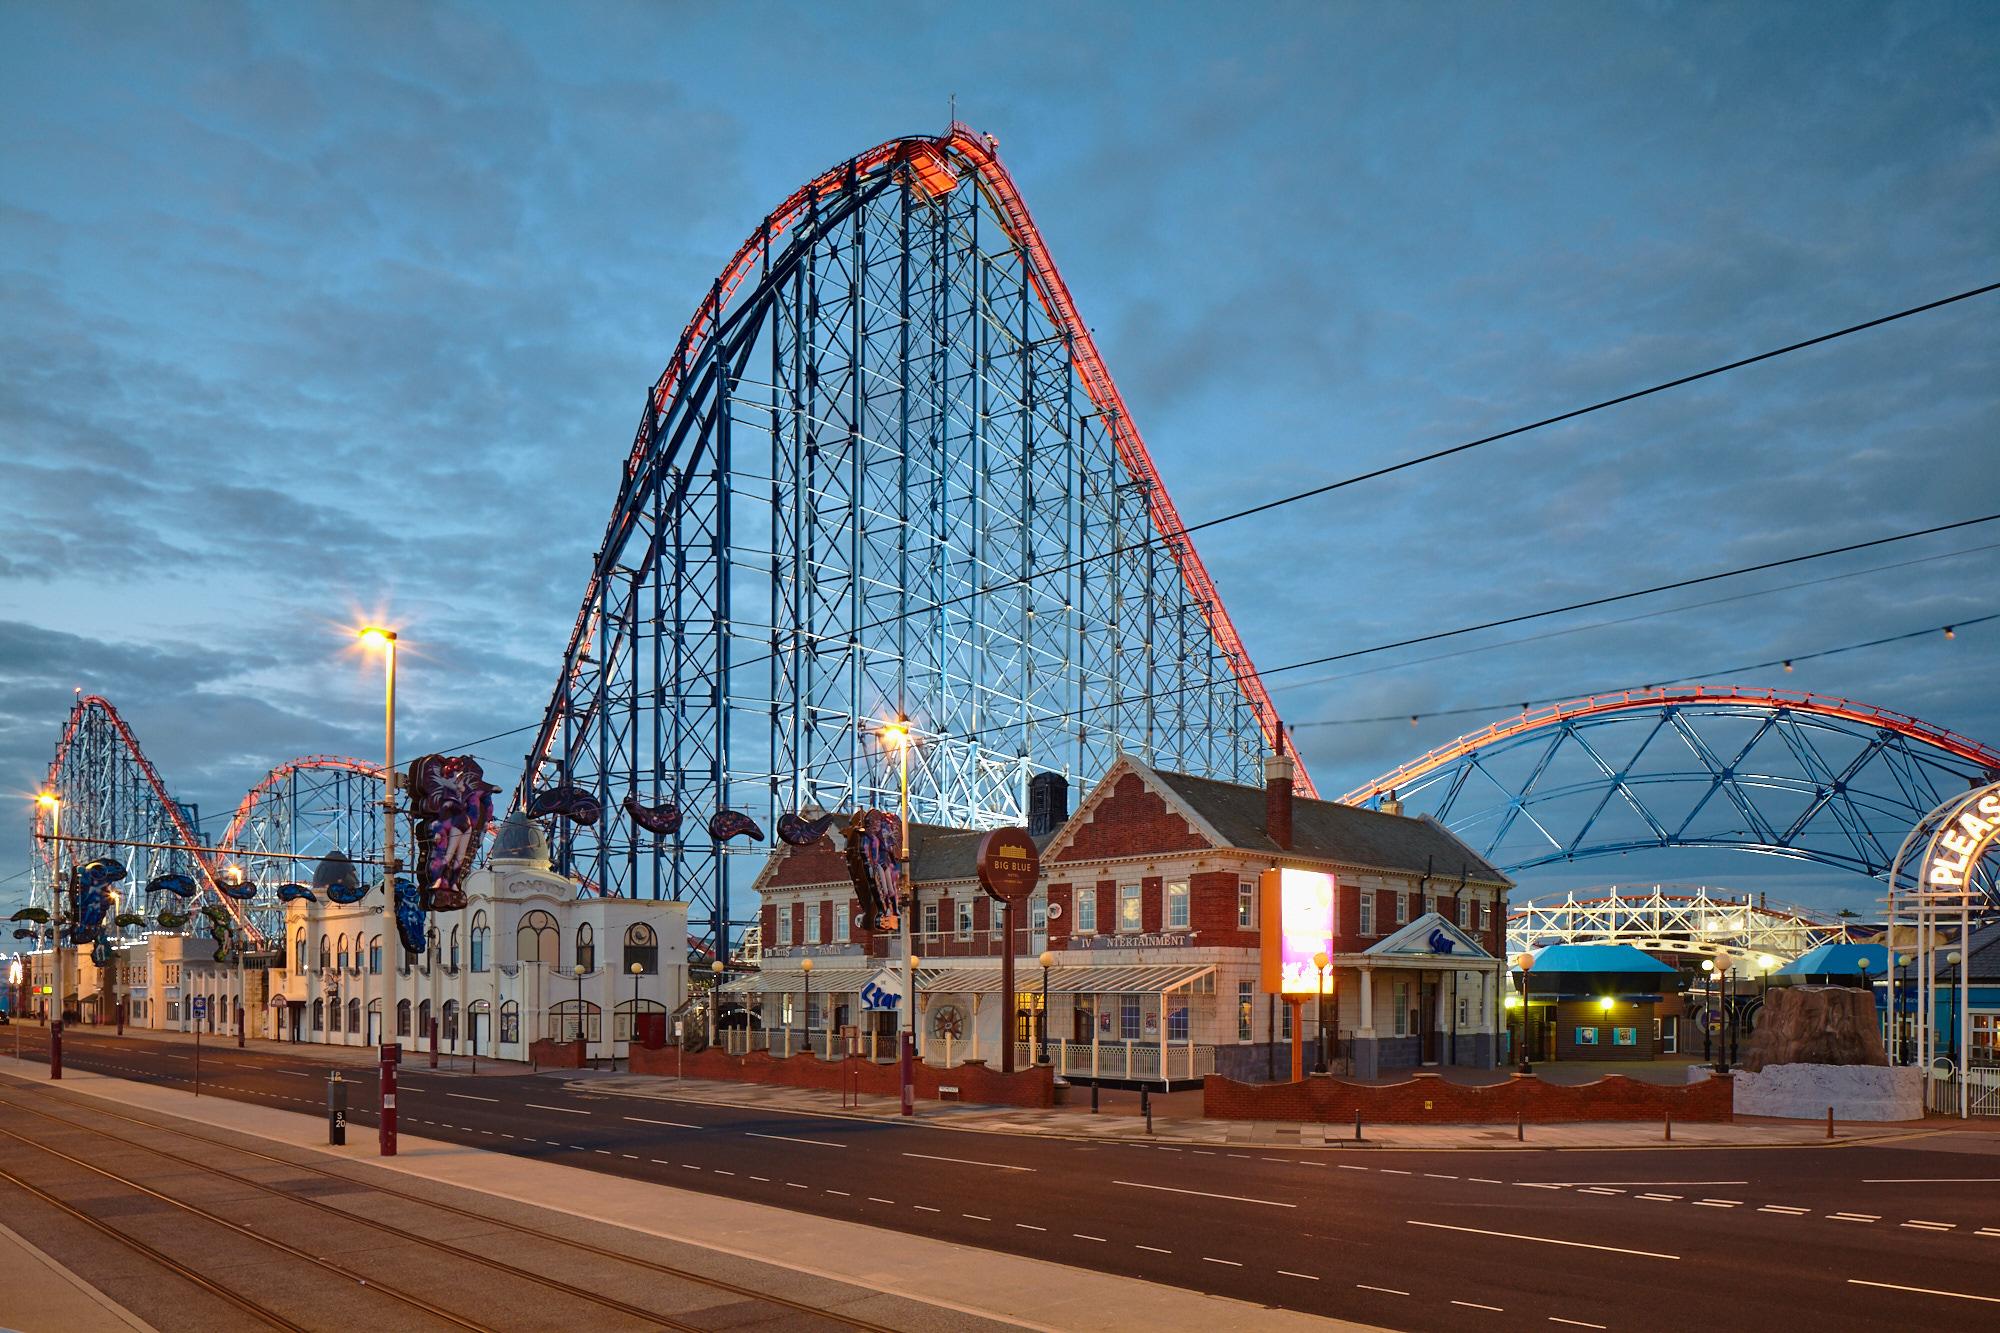 The Big One, Blackpool, England